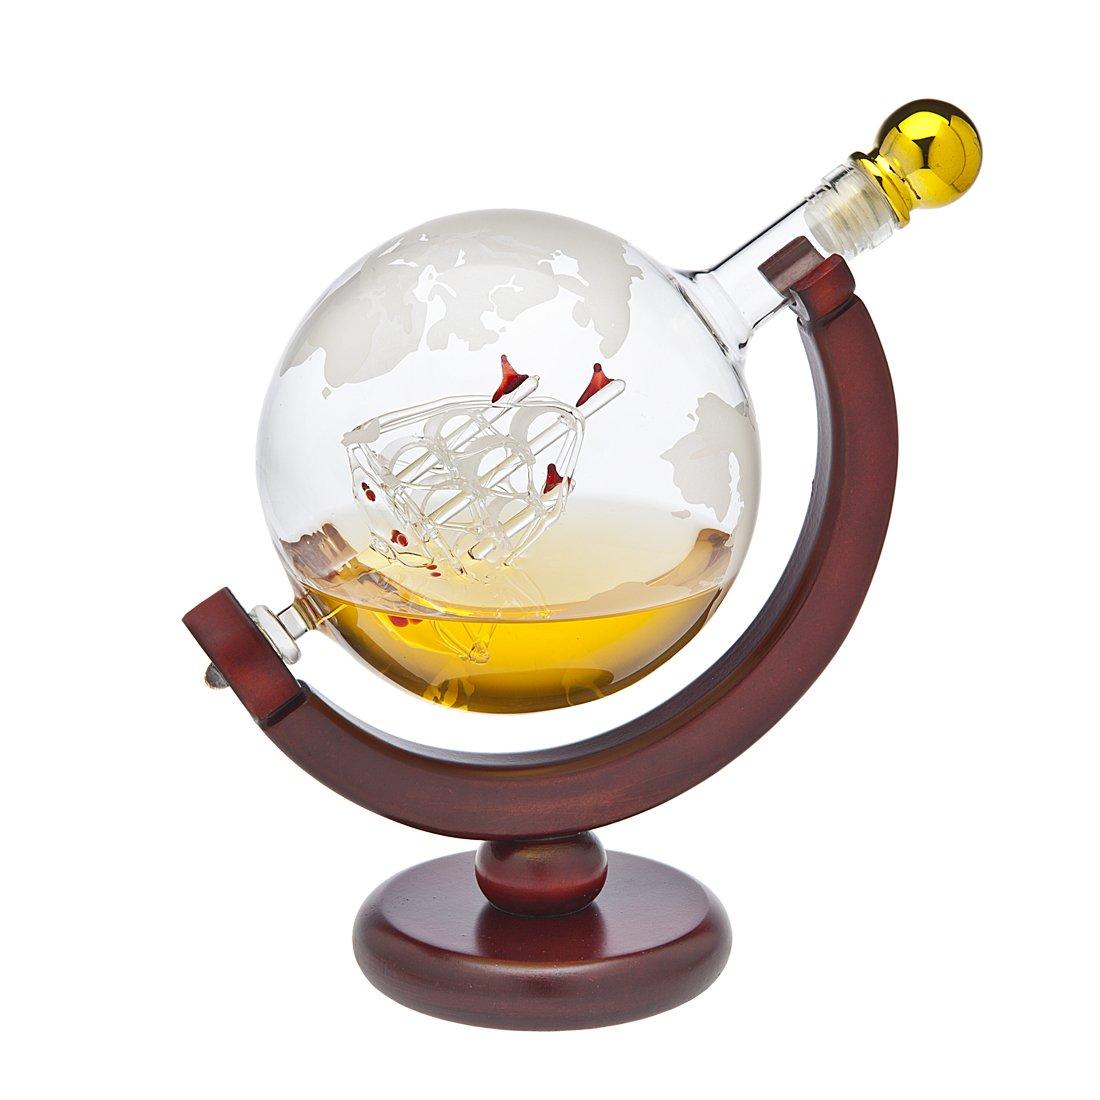 Whiskey Decanter Globe - for Liquor, Scotch, Bourbon, Vodka or Wine - 850ml by Godinger